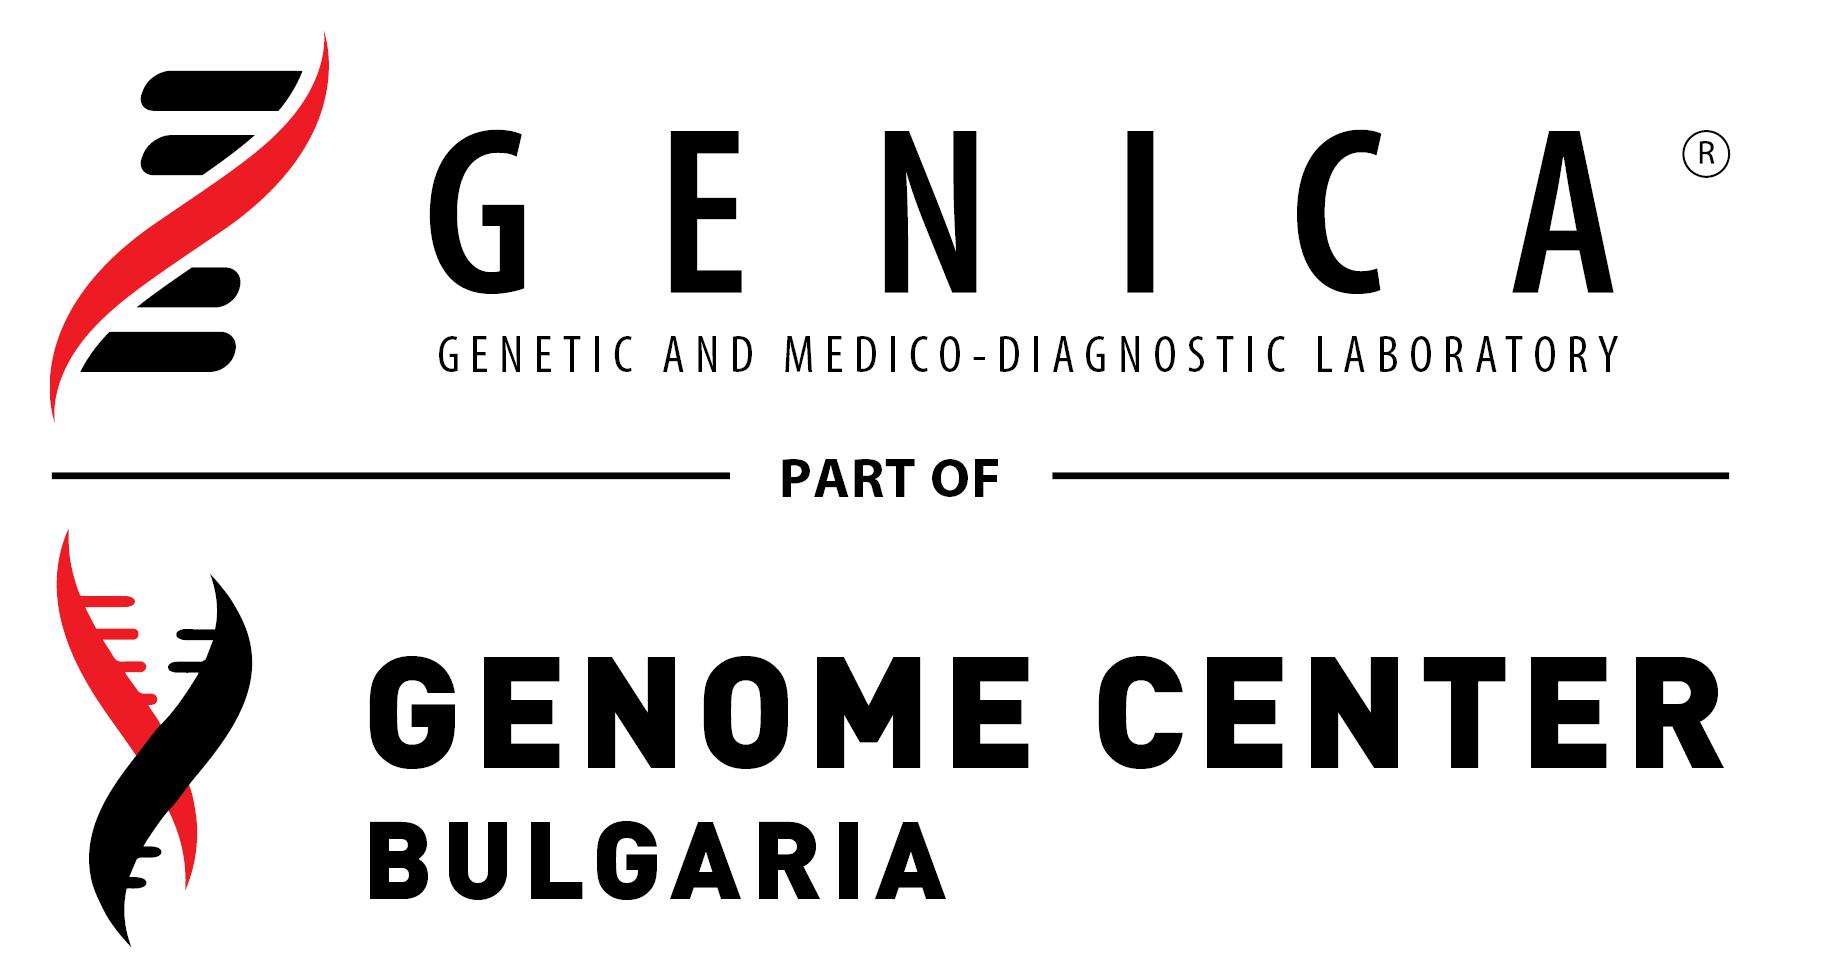 Genica logo